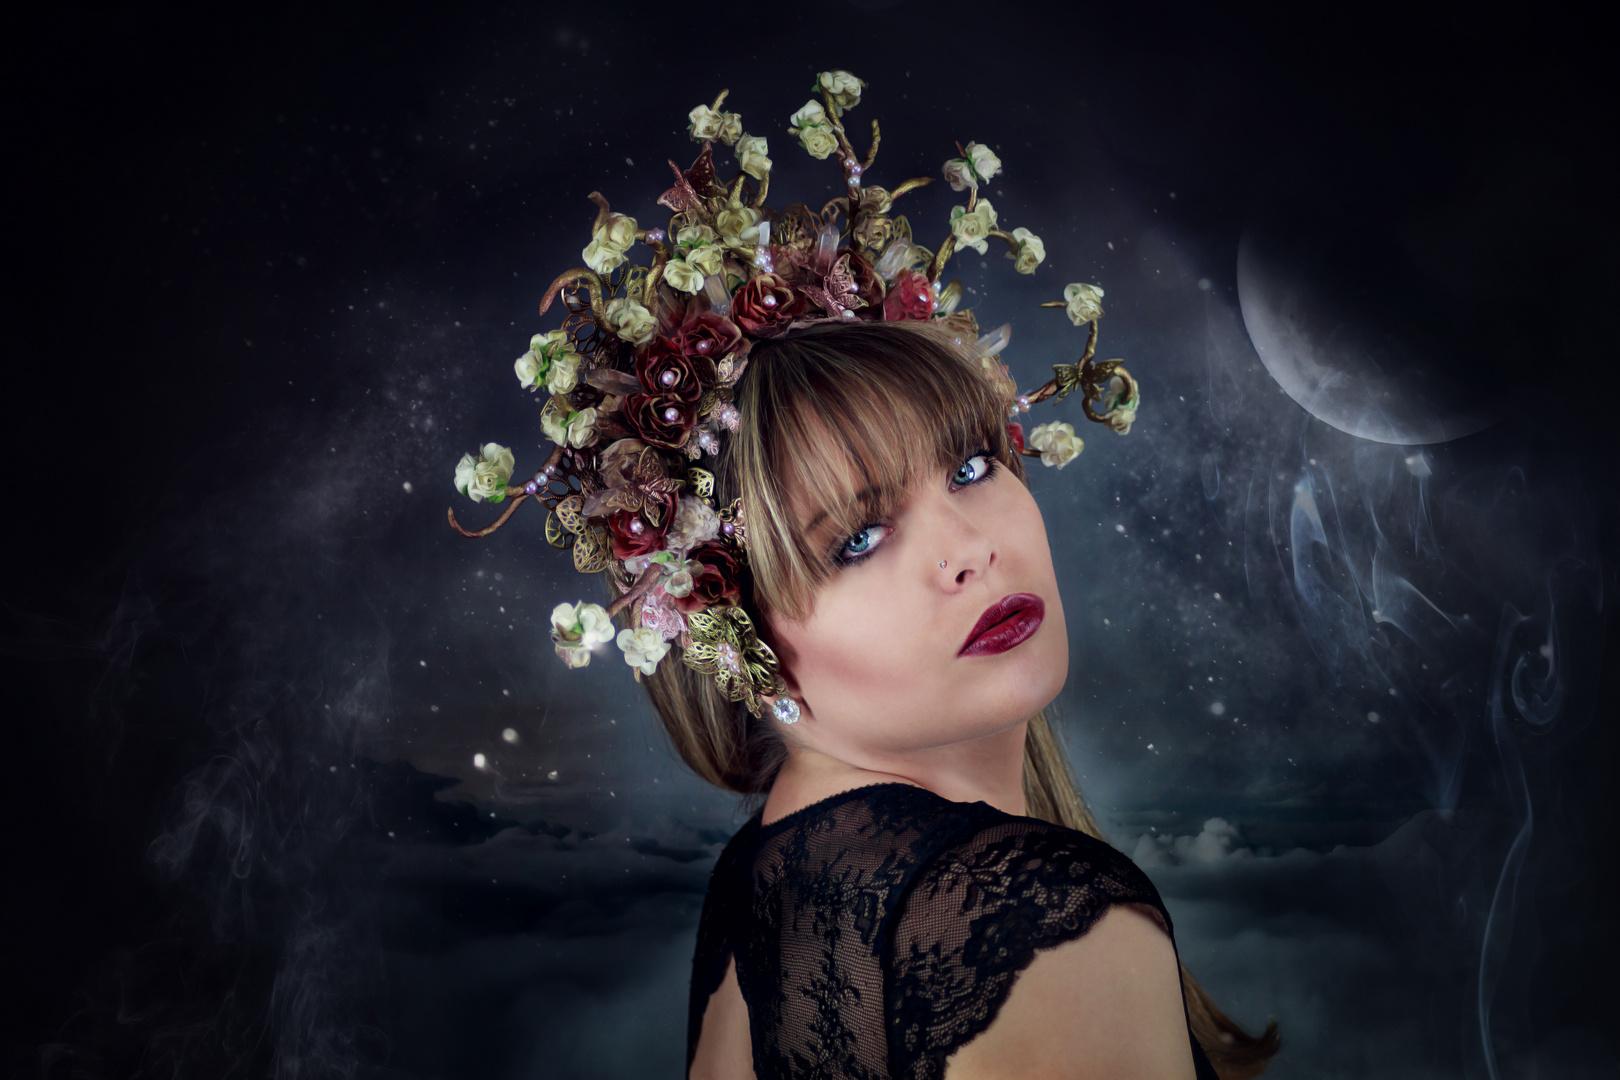 Jenni / Blue_Moon-Fantasy nr.1